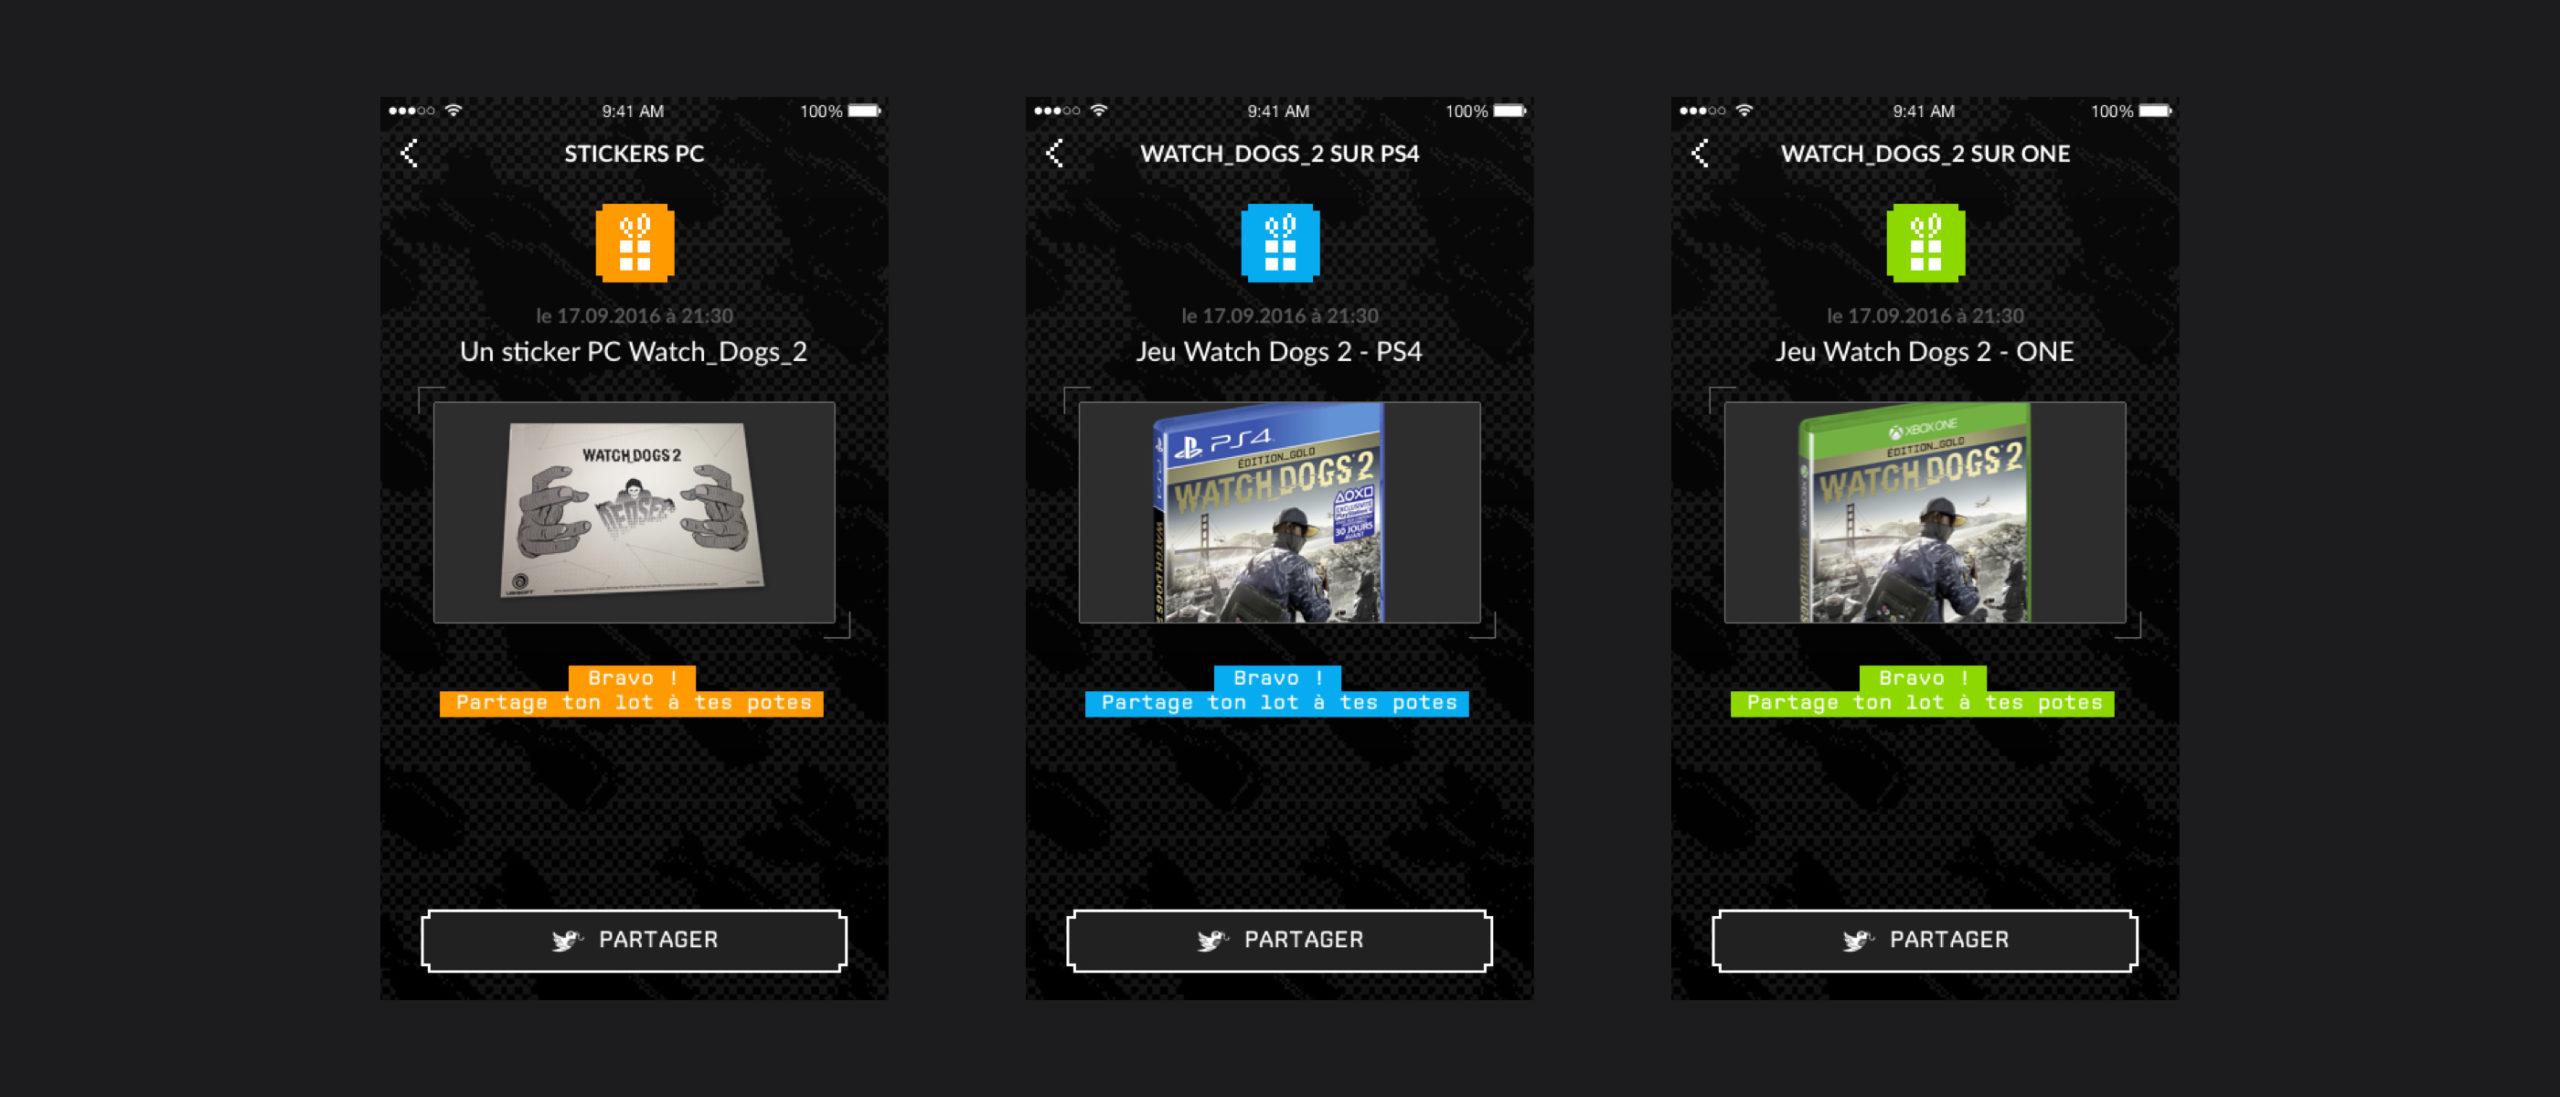 PURPLE-HD-GRAY-planche-app-dark-11